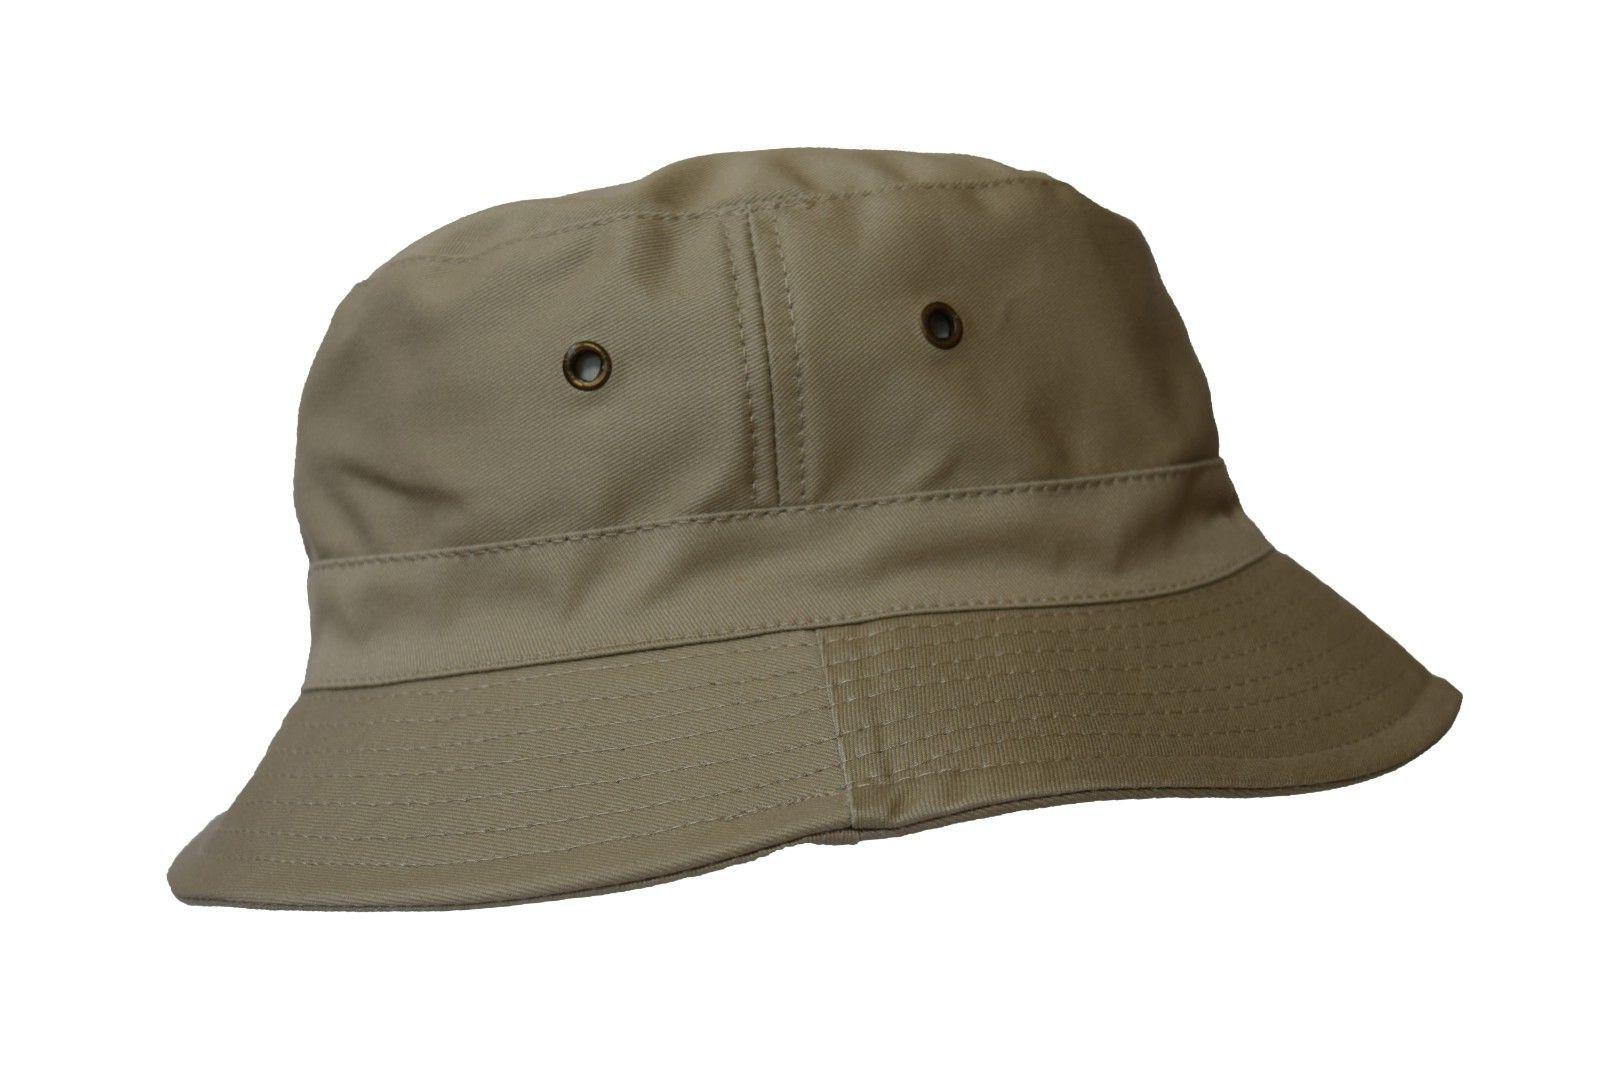 Bucket 2 Boonie Cap Cotton Hunting women